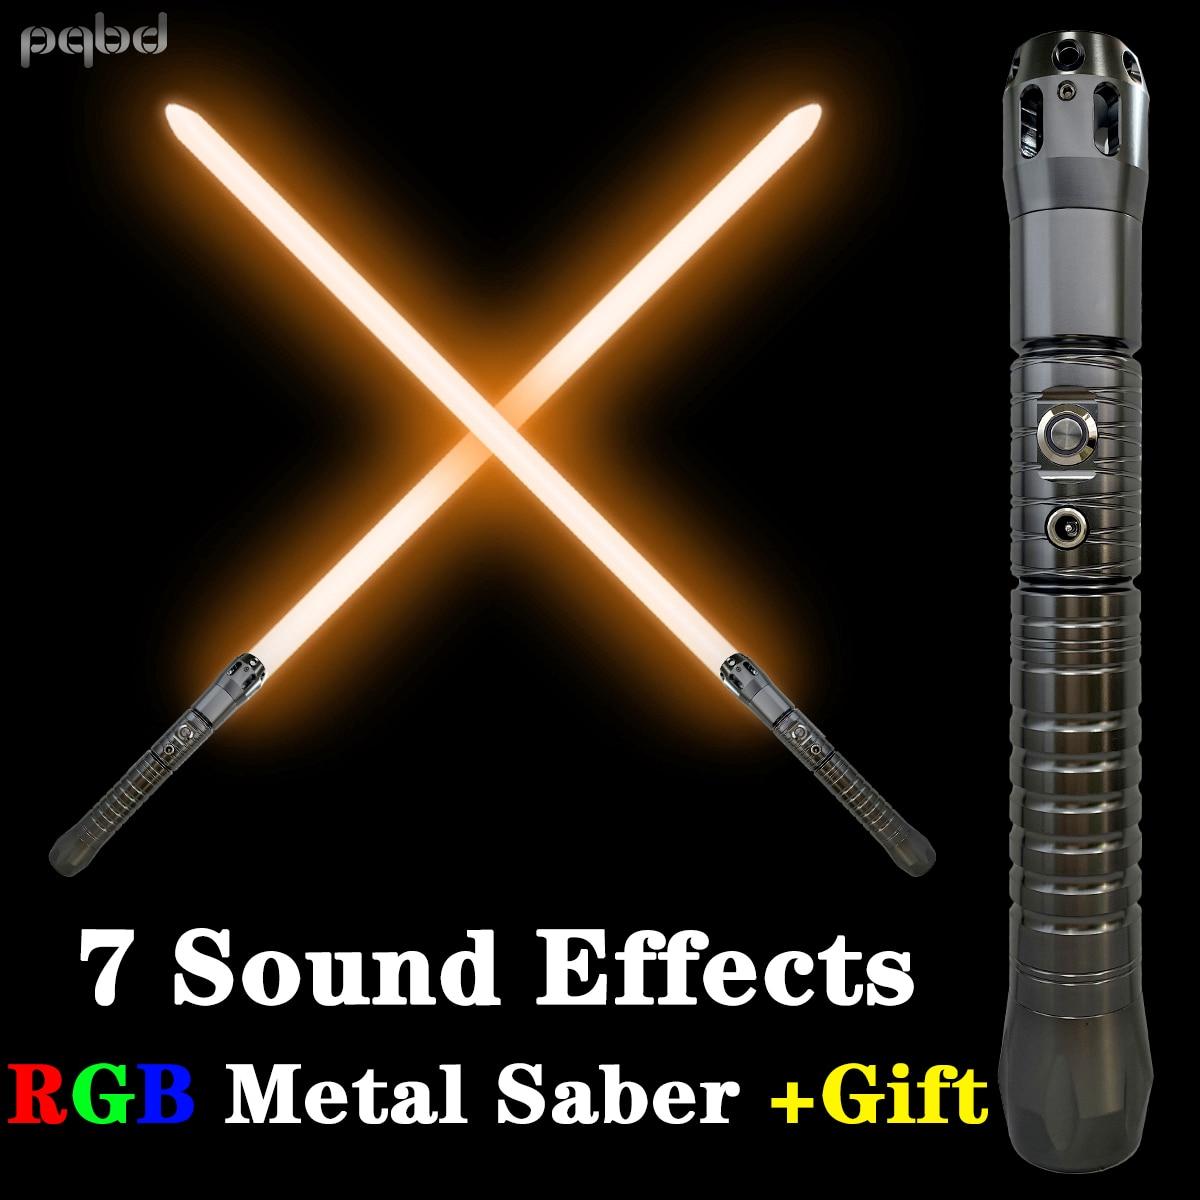 pqbd Lightsaber RGB Force FX FOC Blaster Laser Sword Original Movie Sound Effects Light Saber Automatic NiteCore Extreme LED Toy